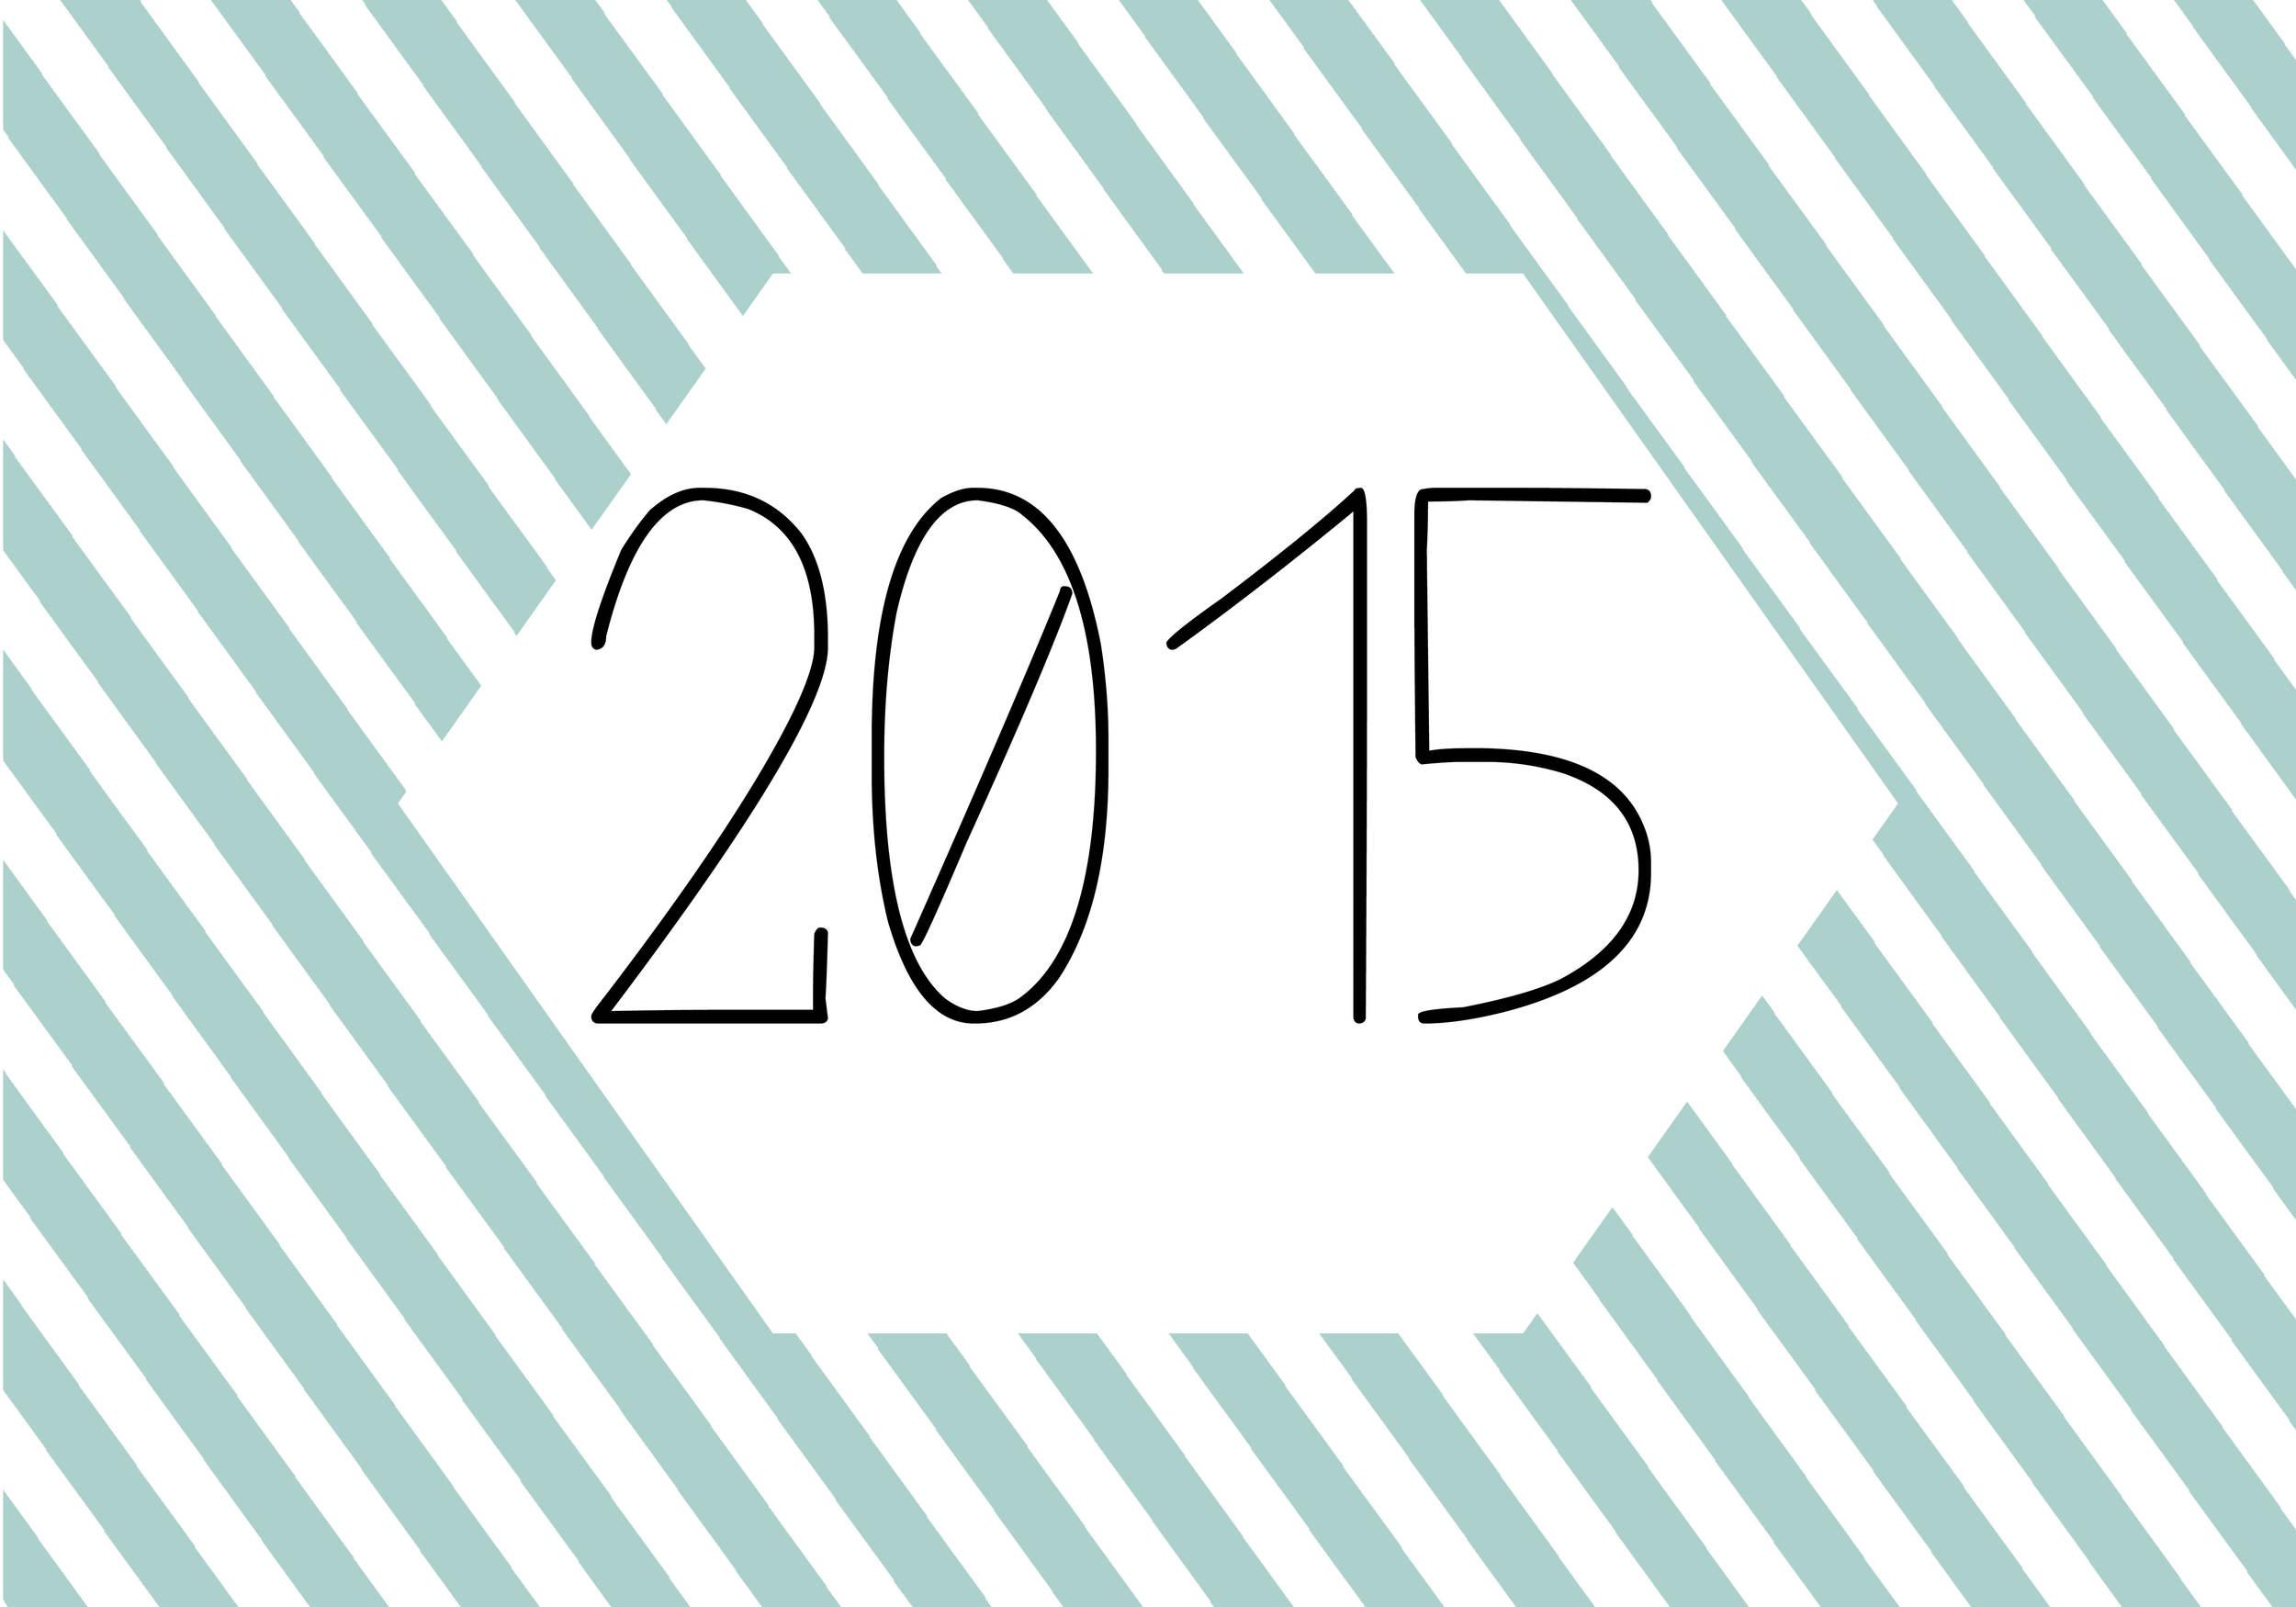 Hyde Evans Design_Trend Report 2015 Blog Post Image.jpg